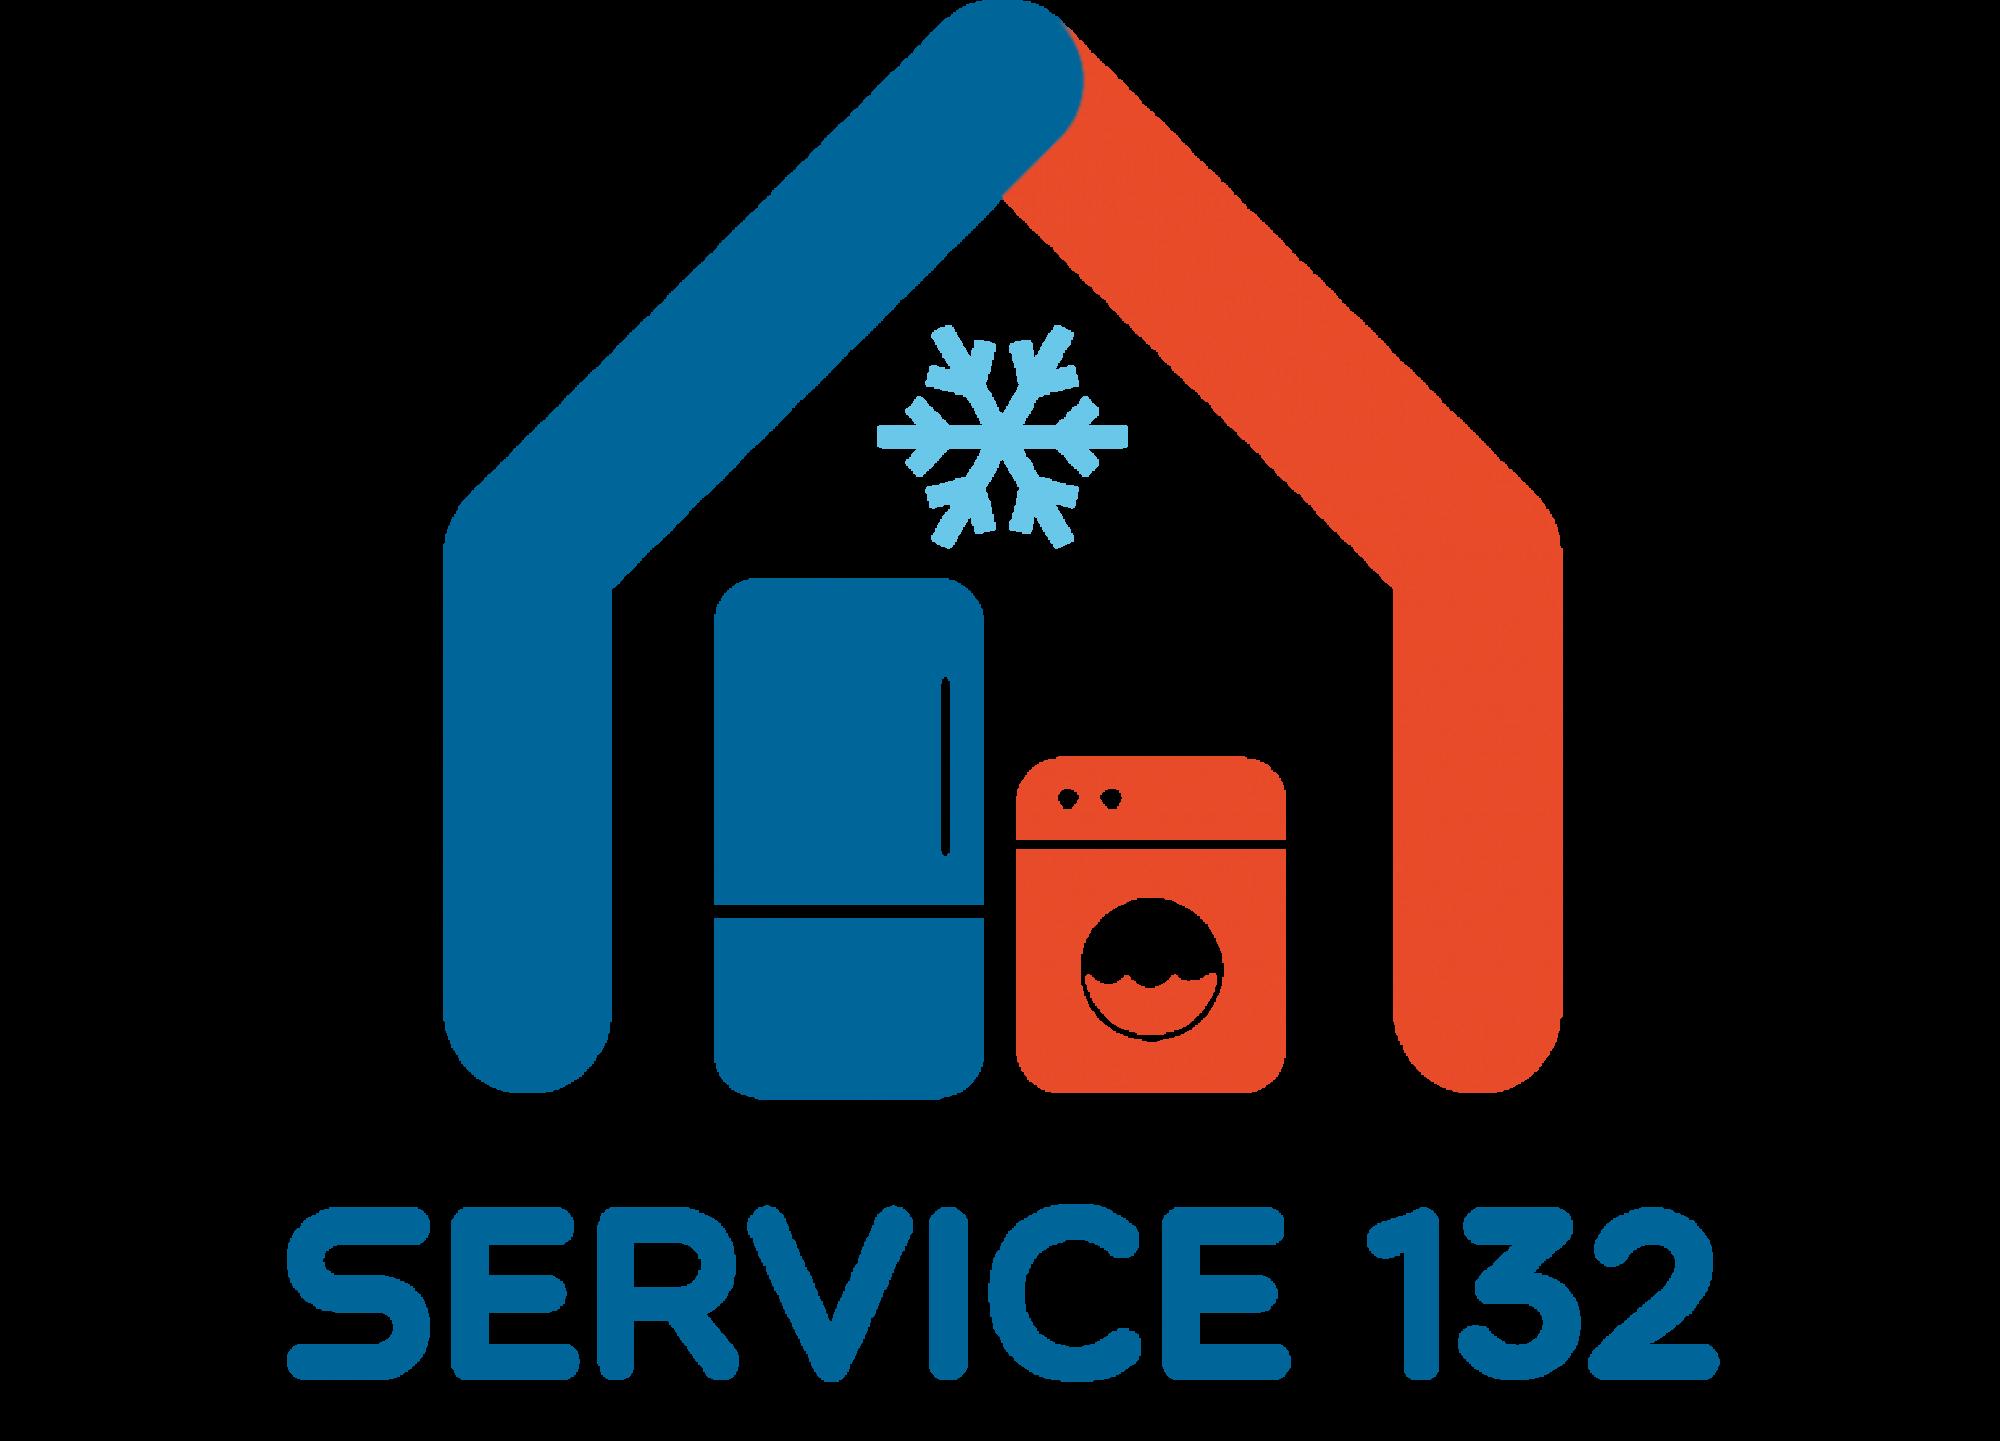 SERVICE 132